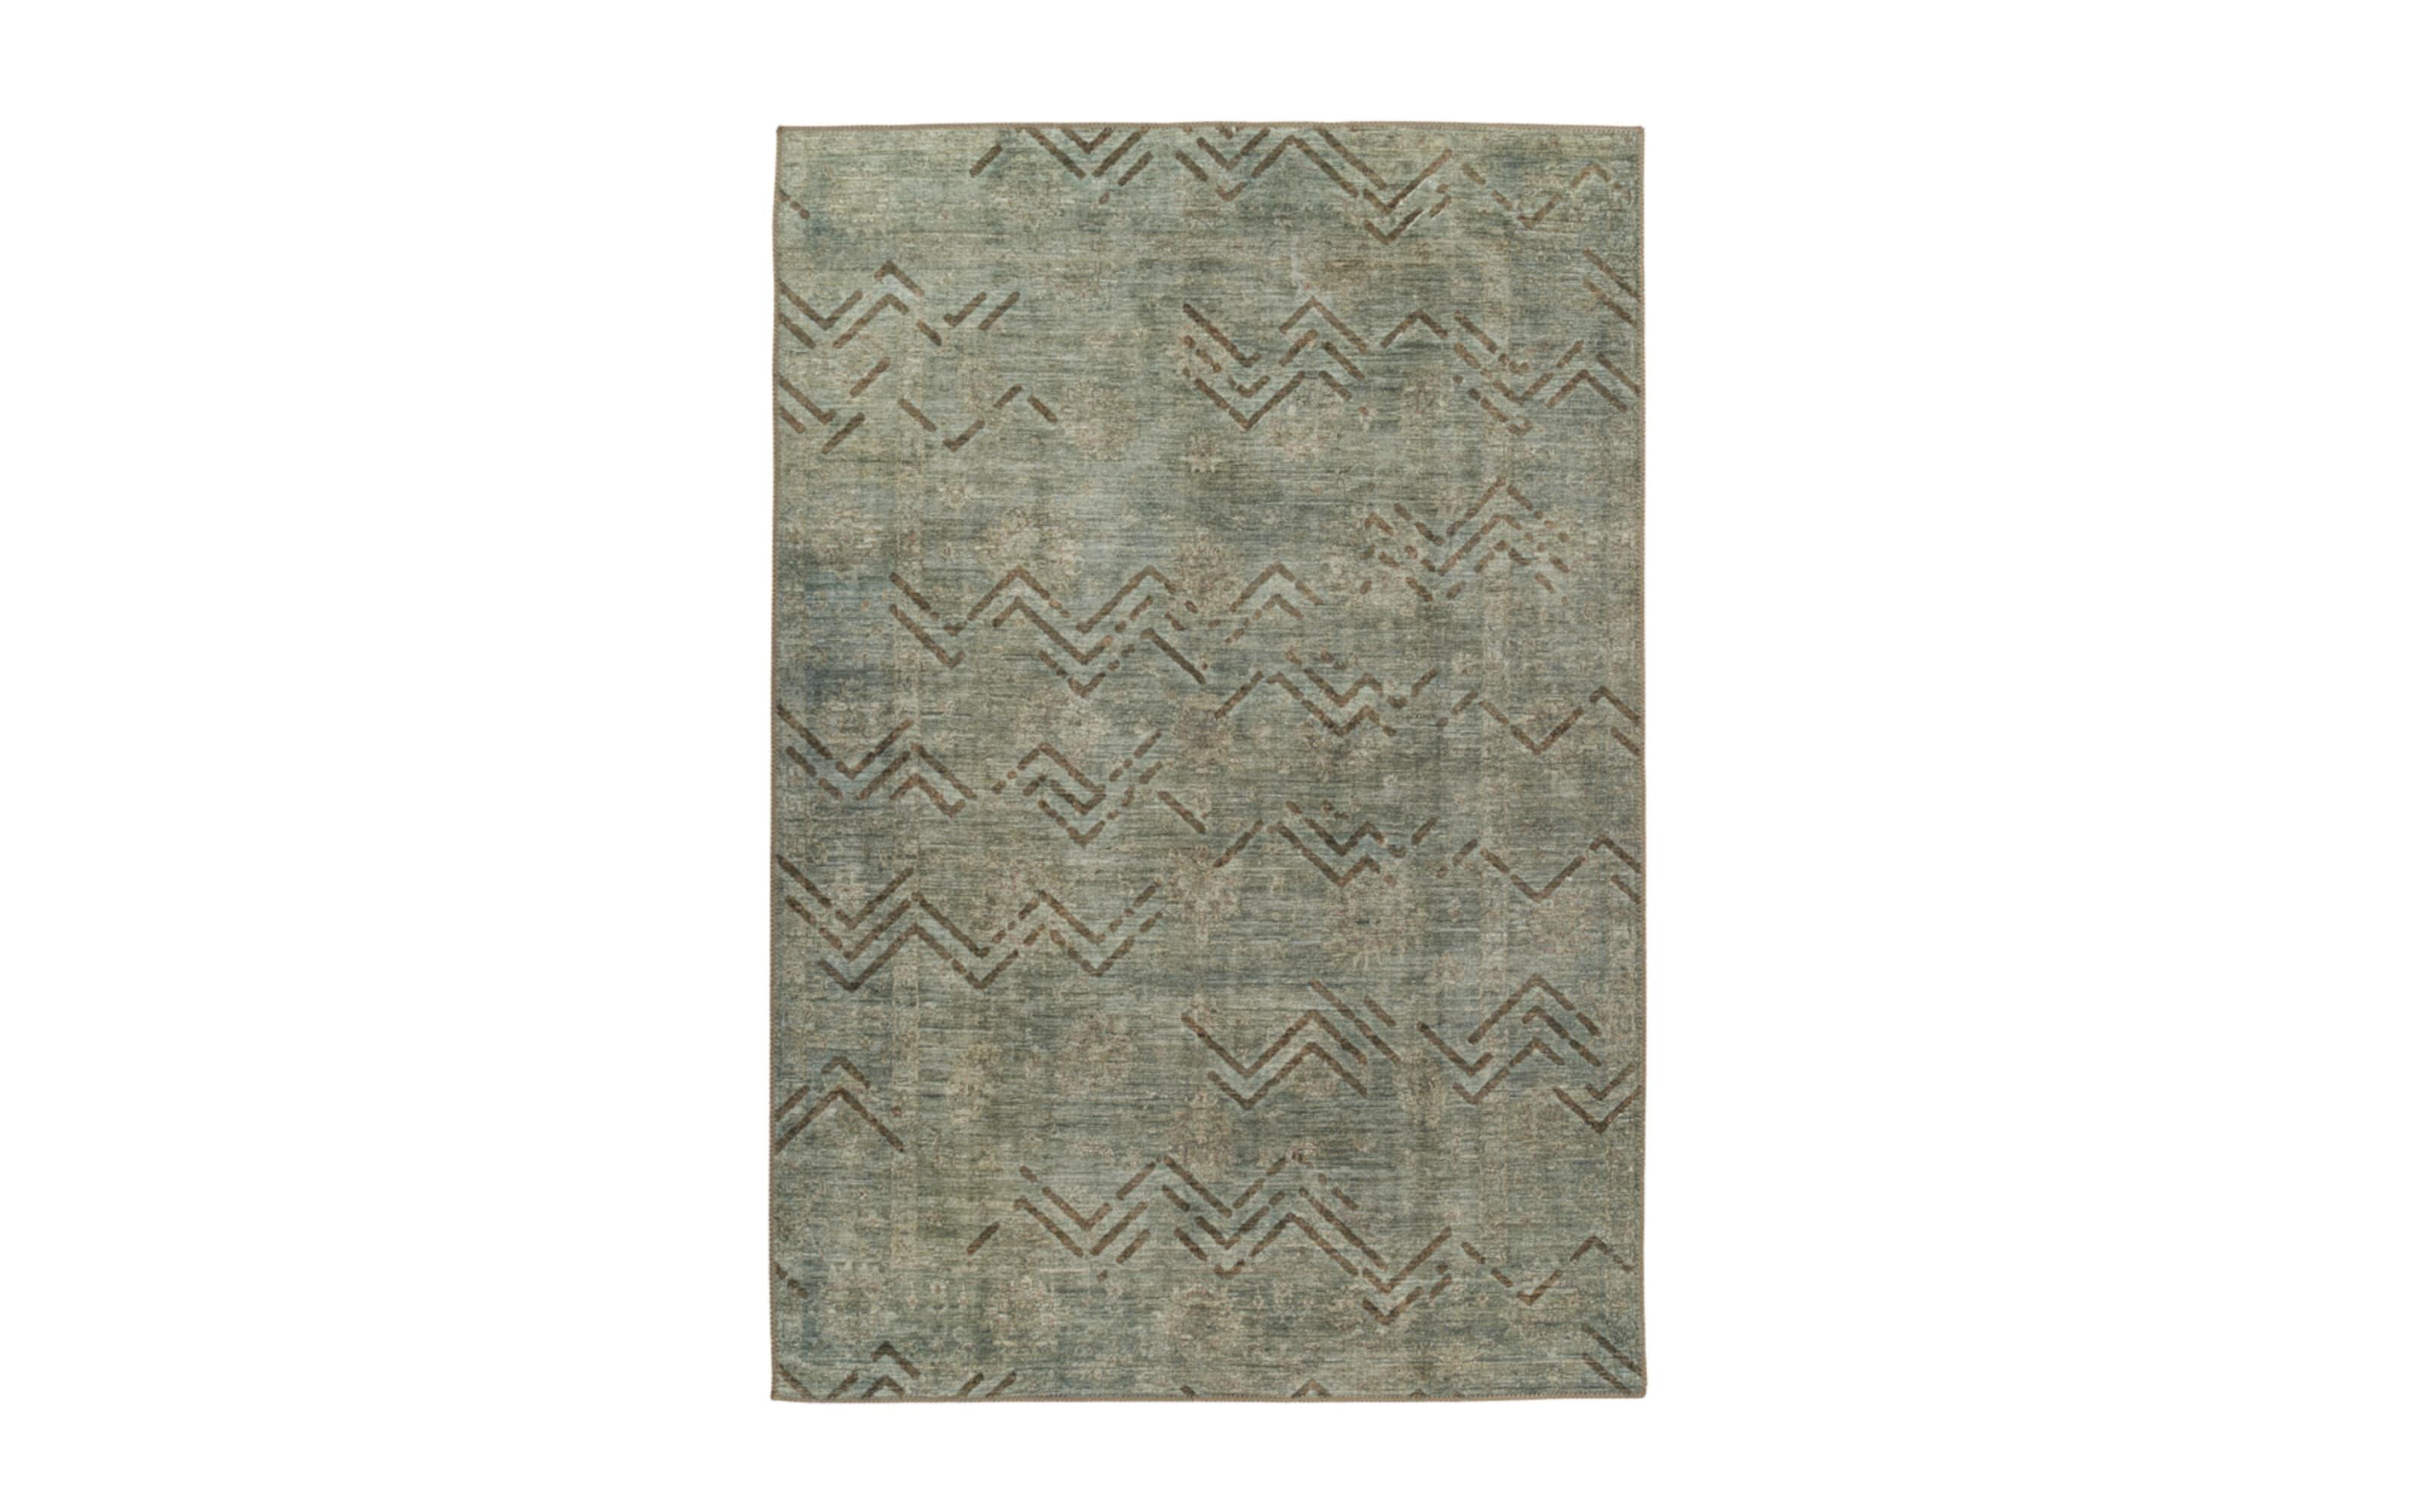 Teppich Antique 325 in khaki, 160 x 230 cm